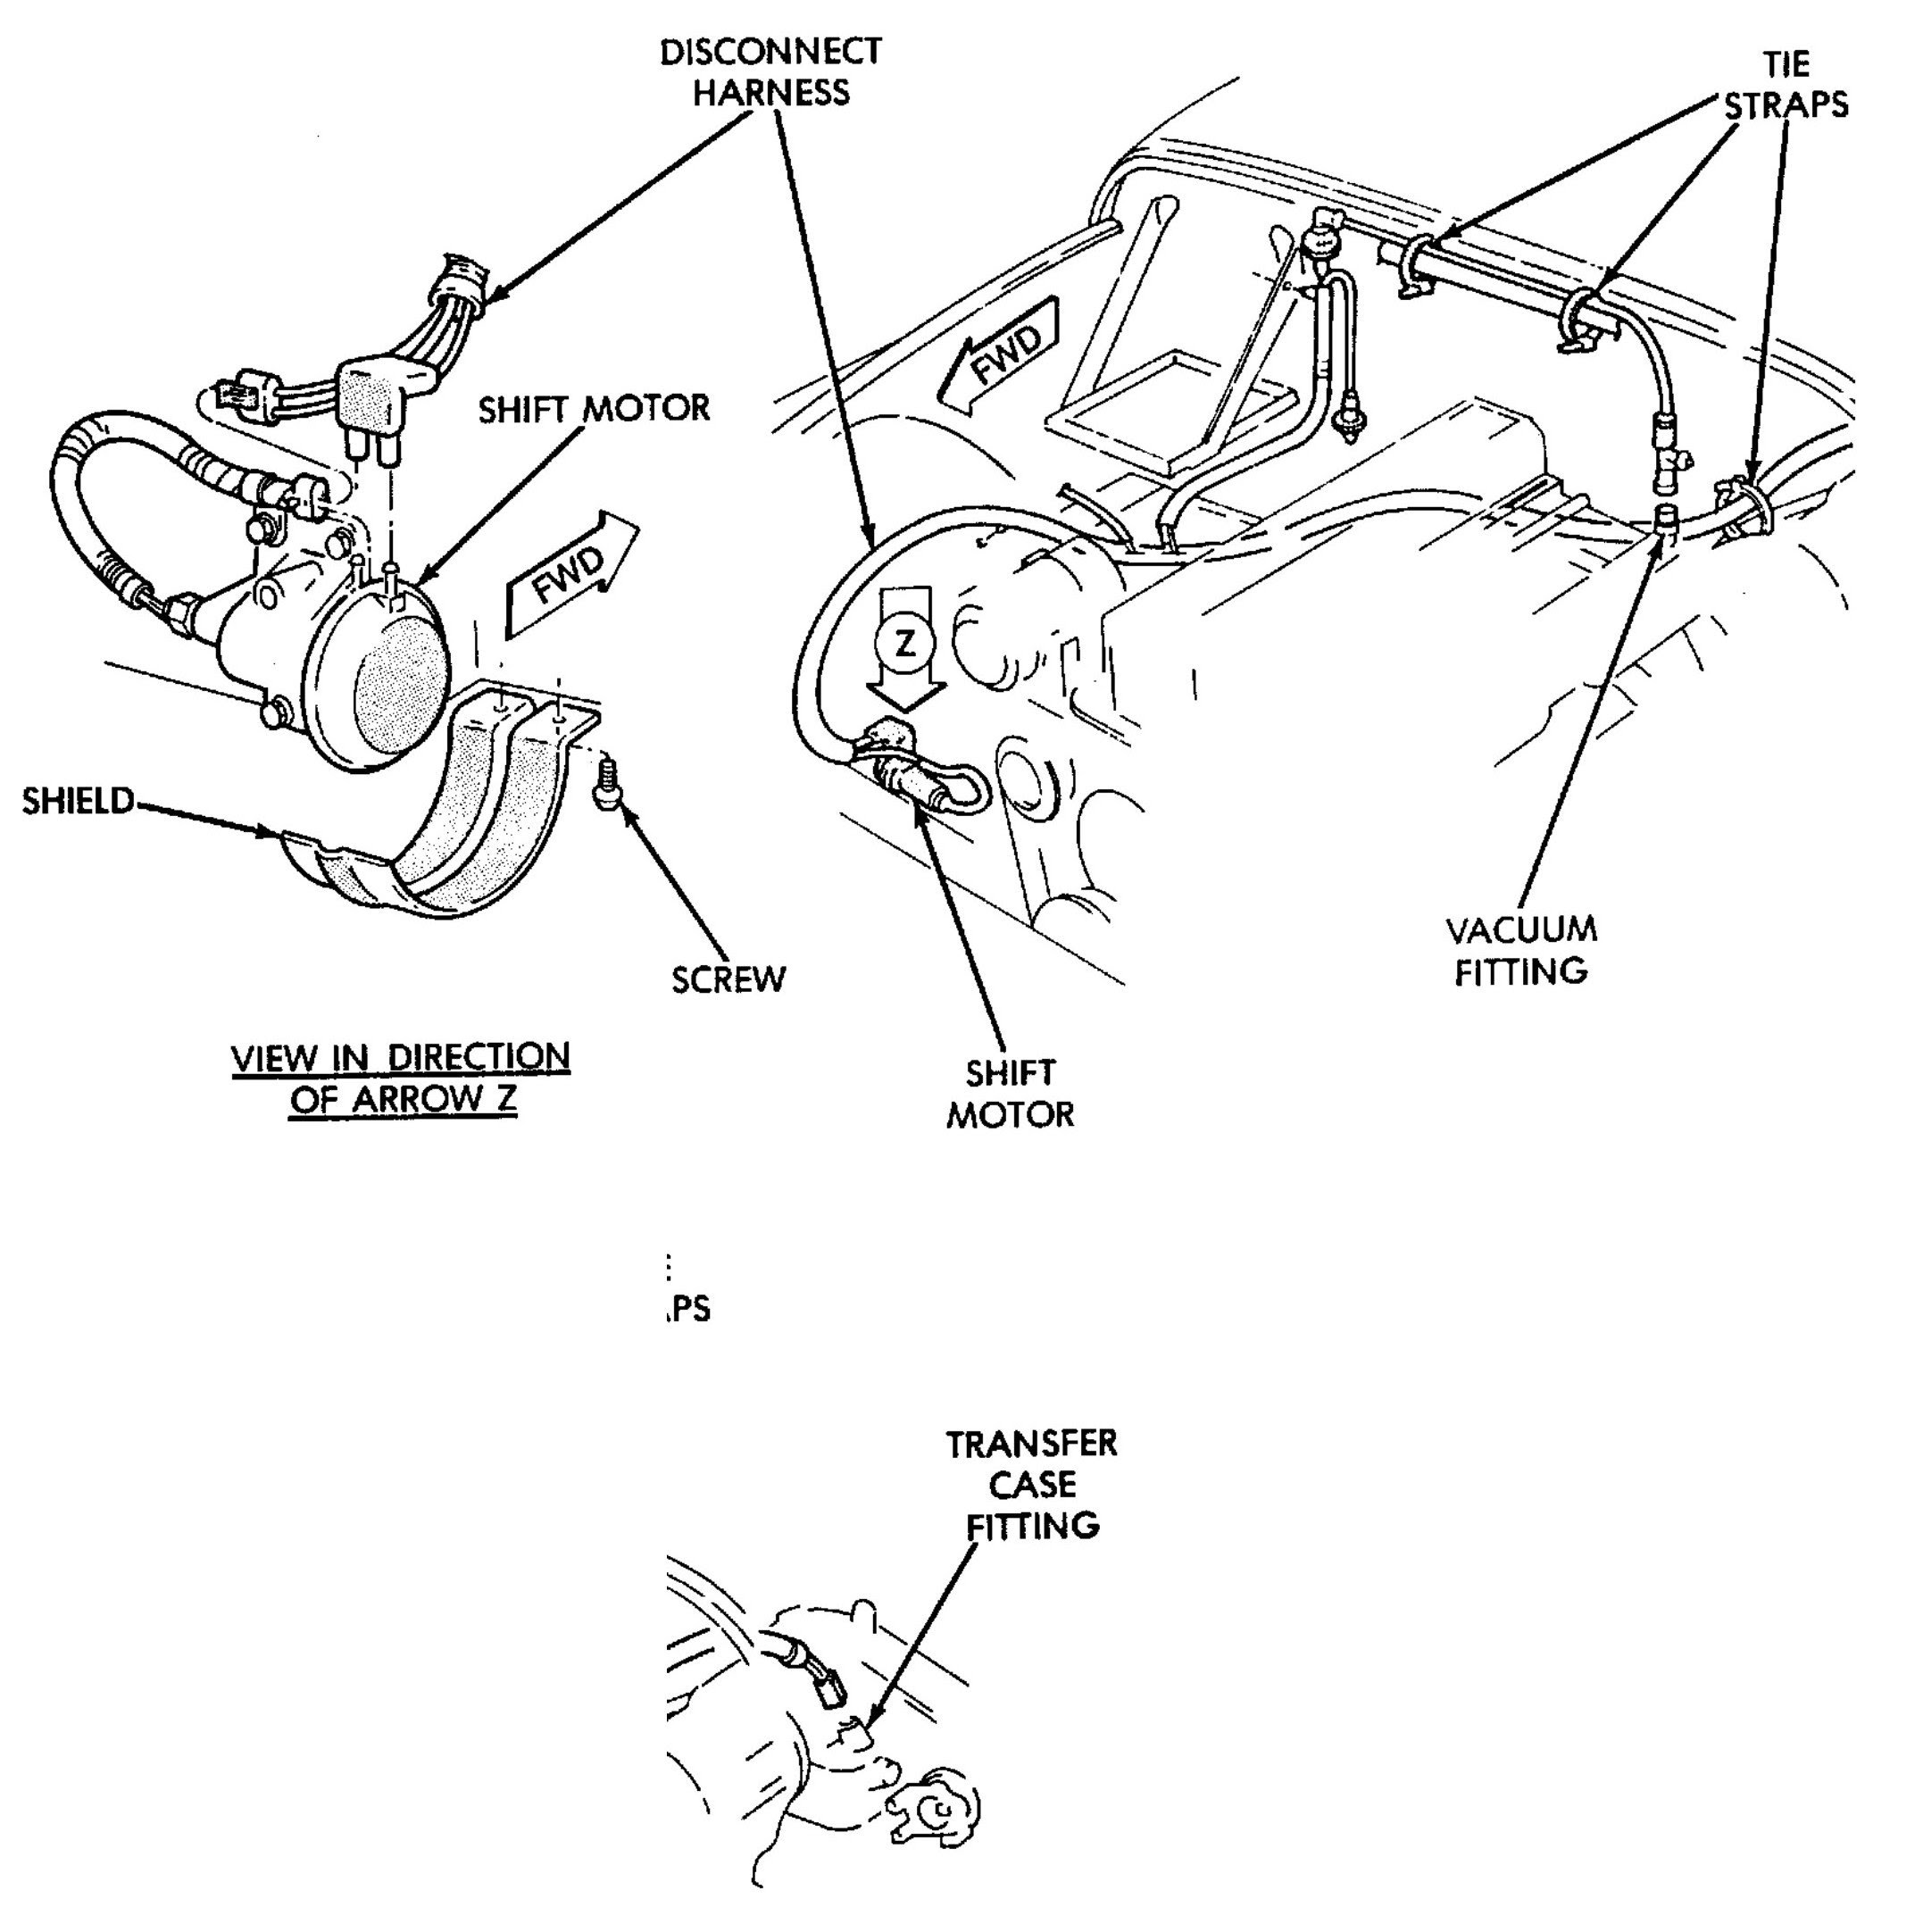 Diagram Wiring Diagram 1995 Jeep Yj 2 5l Full Version Hd Quality 2 5l Diagramhoppec Informazionihotel It